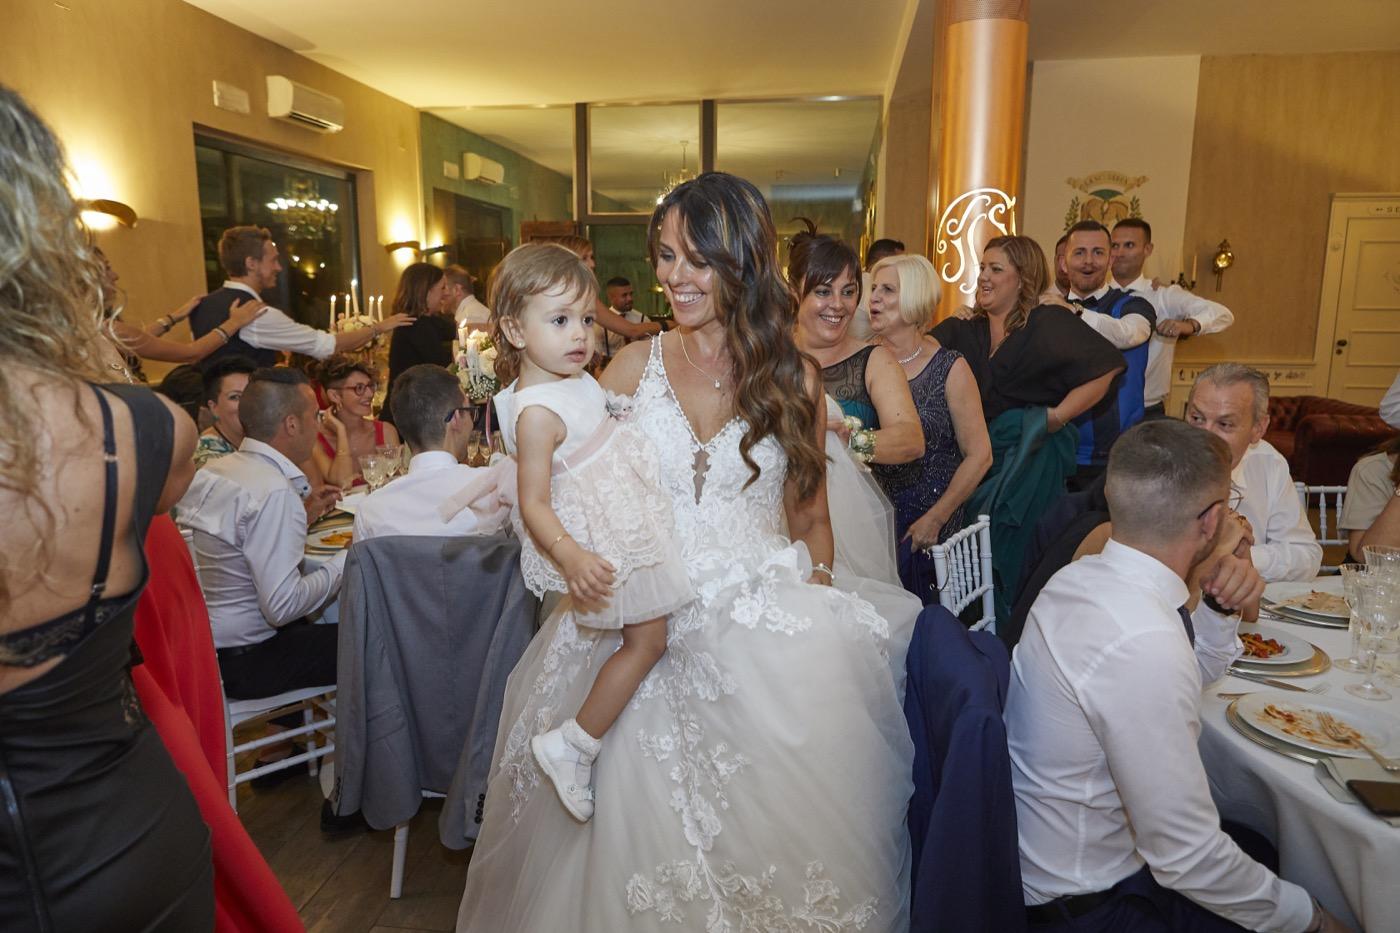 Claudio-Coppola-wedding-photographer-la-scuderia-eventi-preparativi-la-rosetta-perugia-85